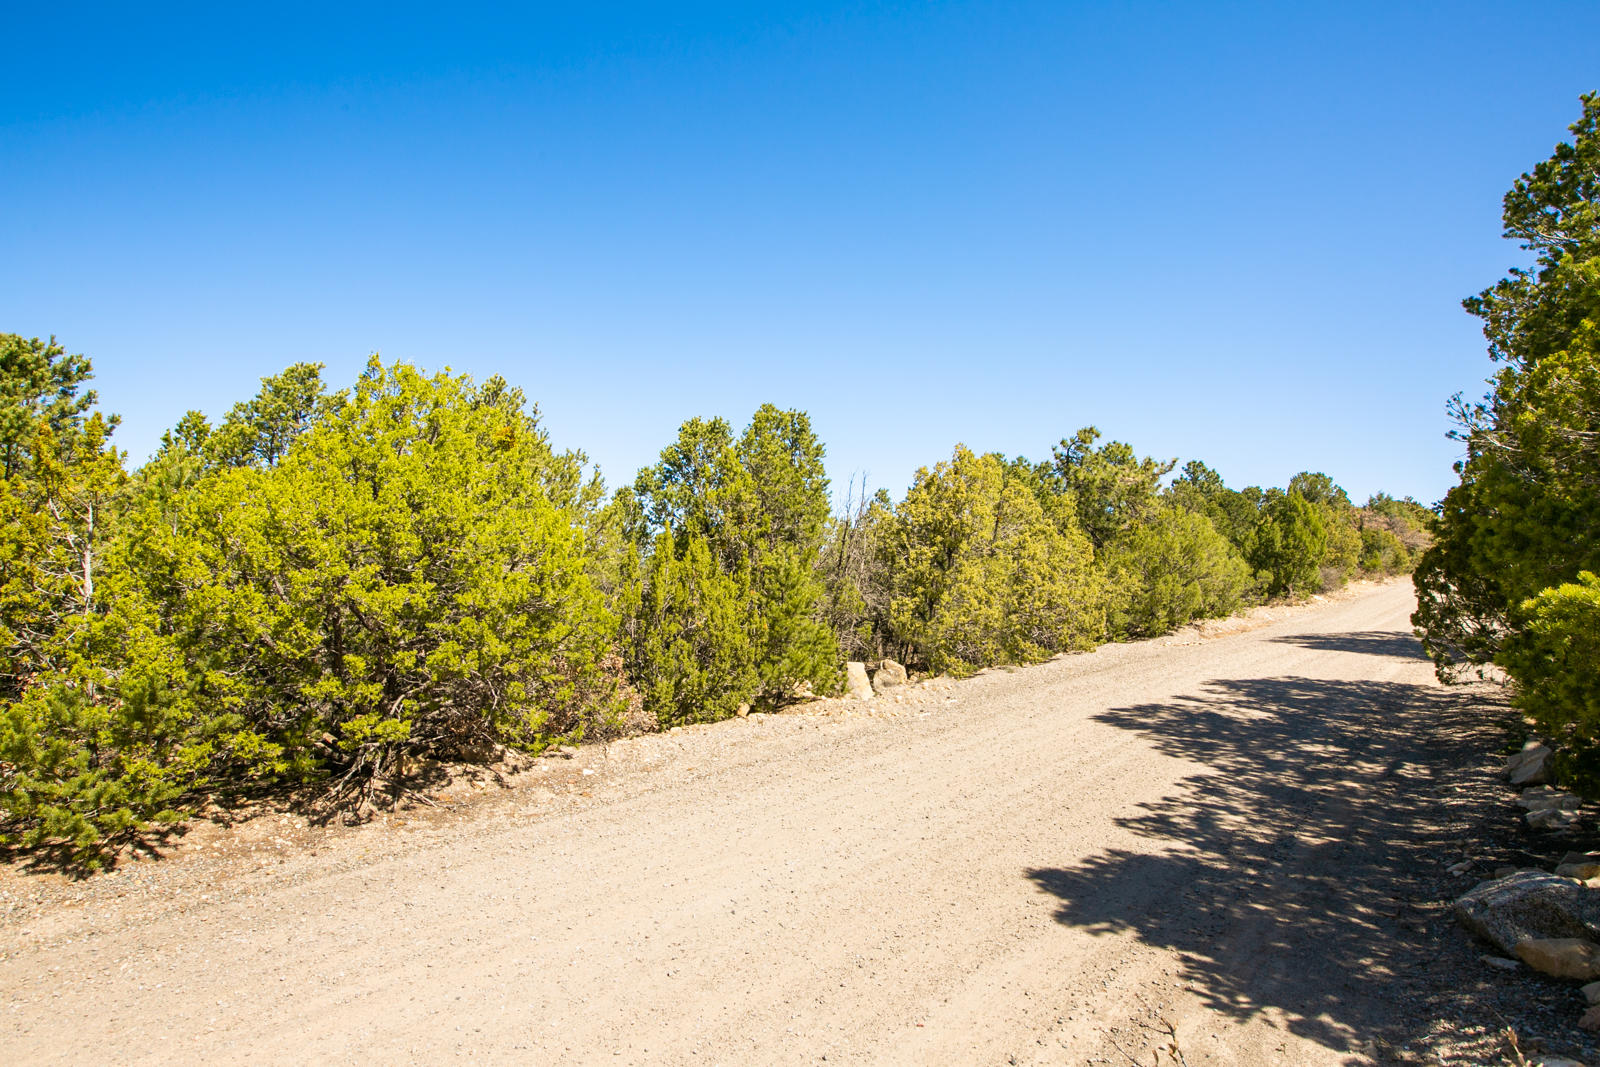 25 RIDGE Drive, Cedar Crest, NM 87008 - Cedar Crest, NM real estate listing